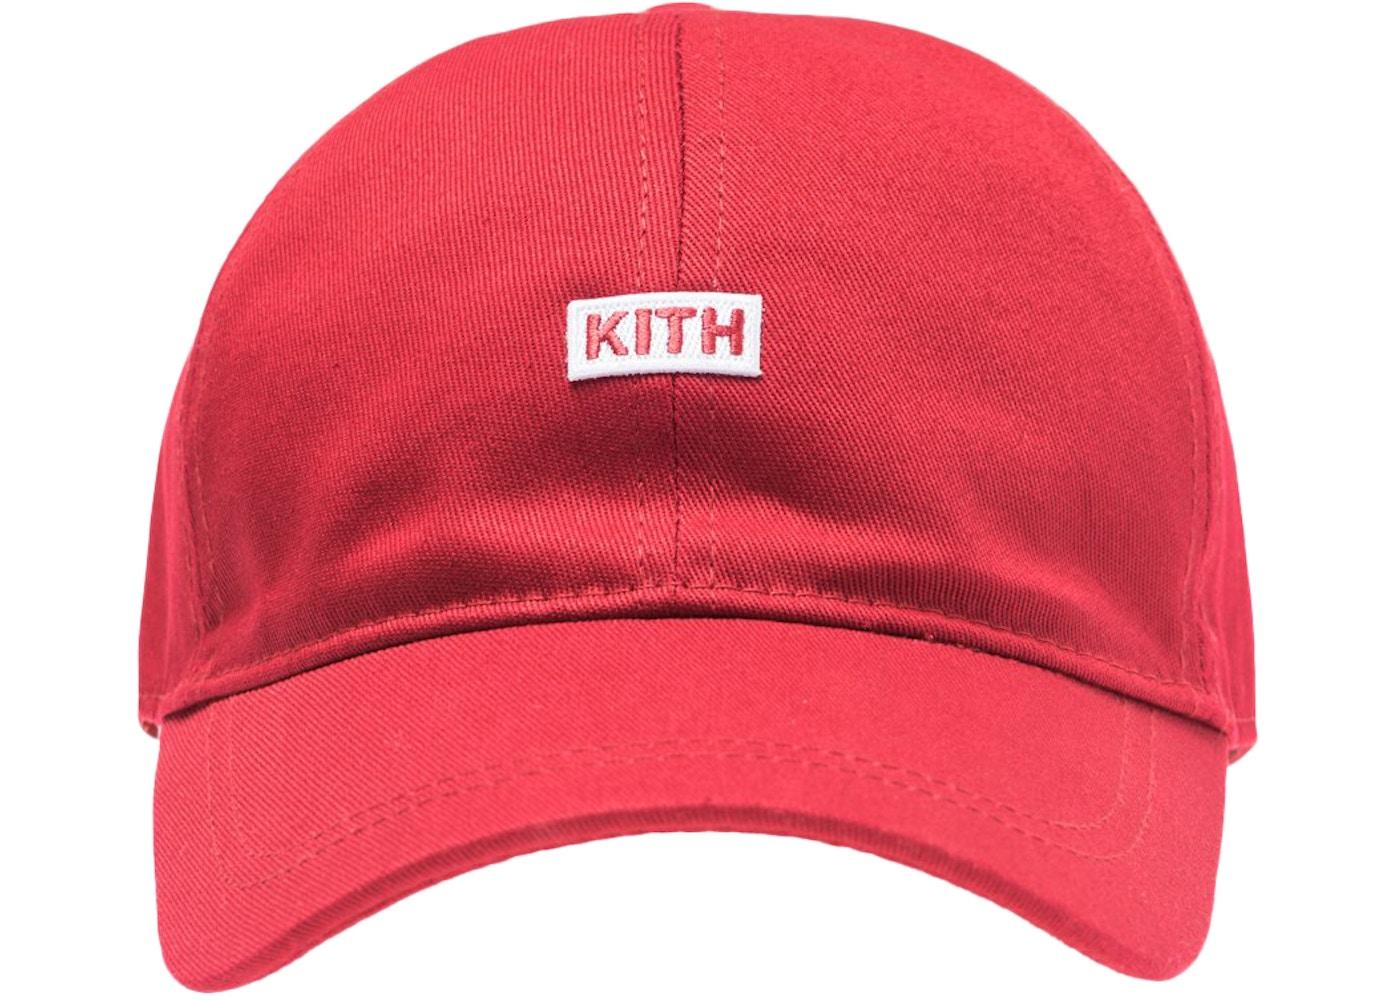 ef7ac039 Streetwear - Kith Headwear - New Lowest Asks